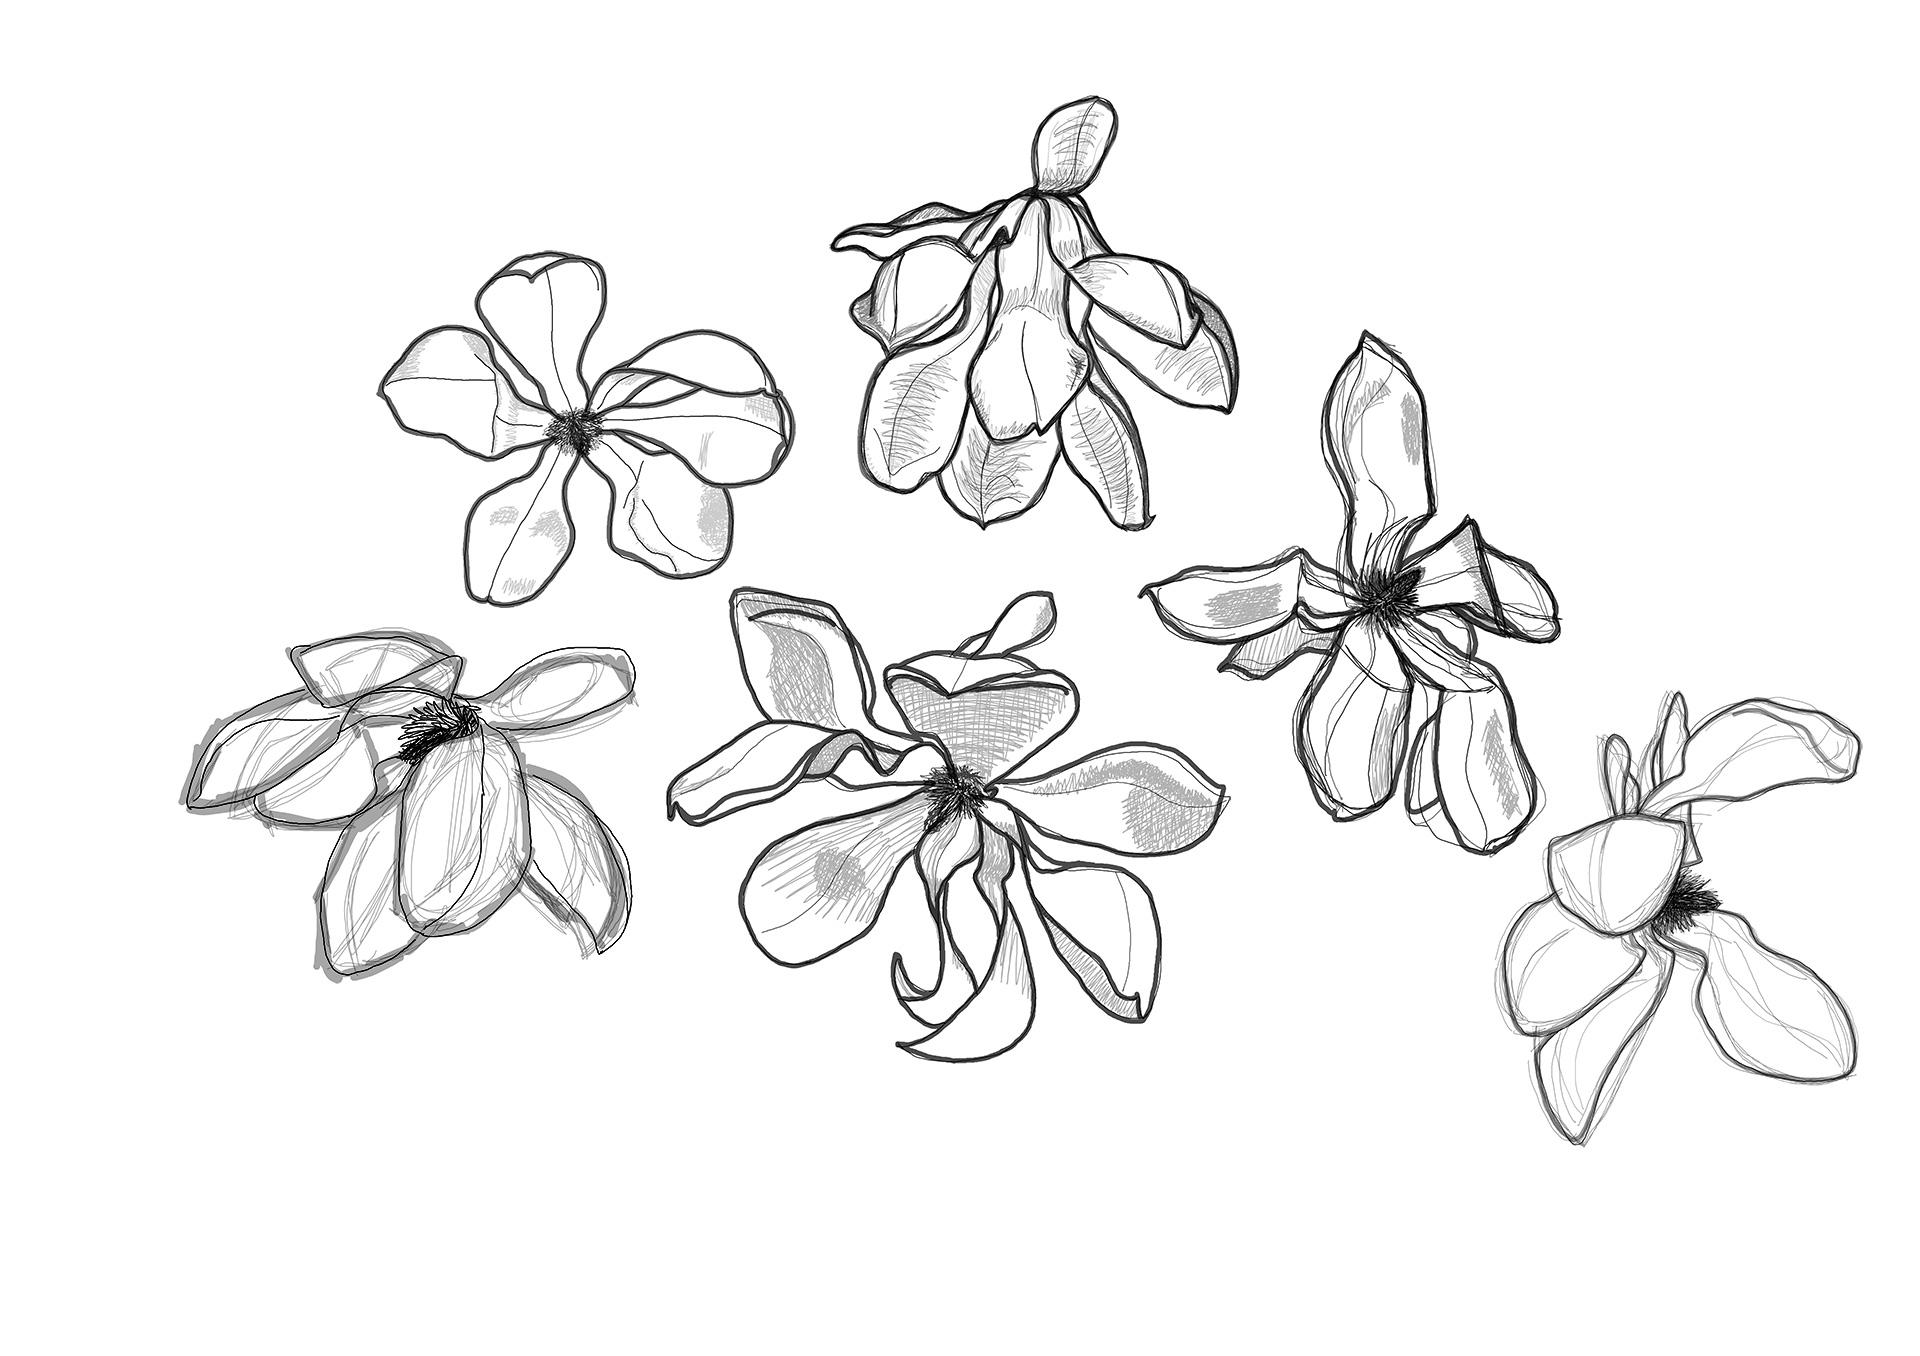 Magnolia Drawing 2